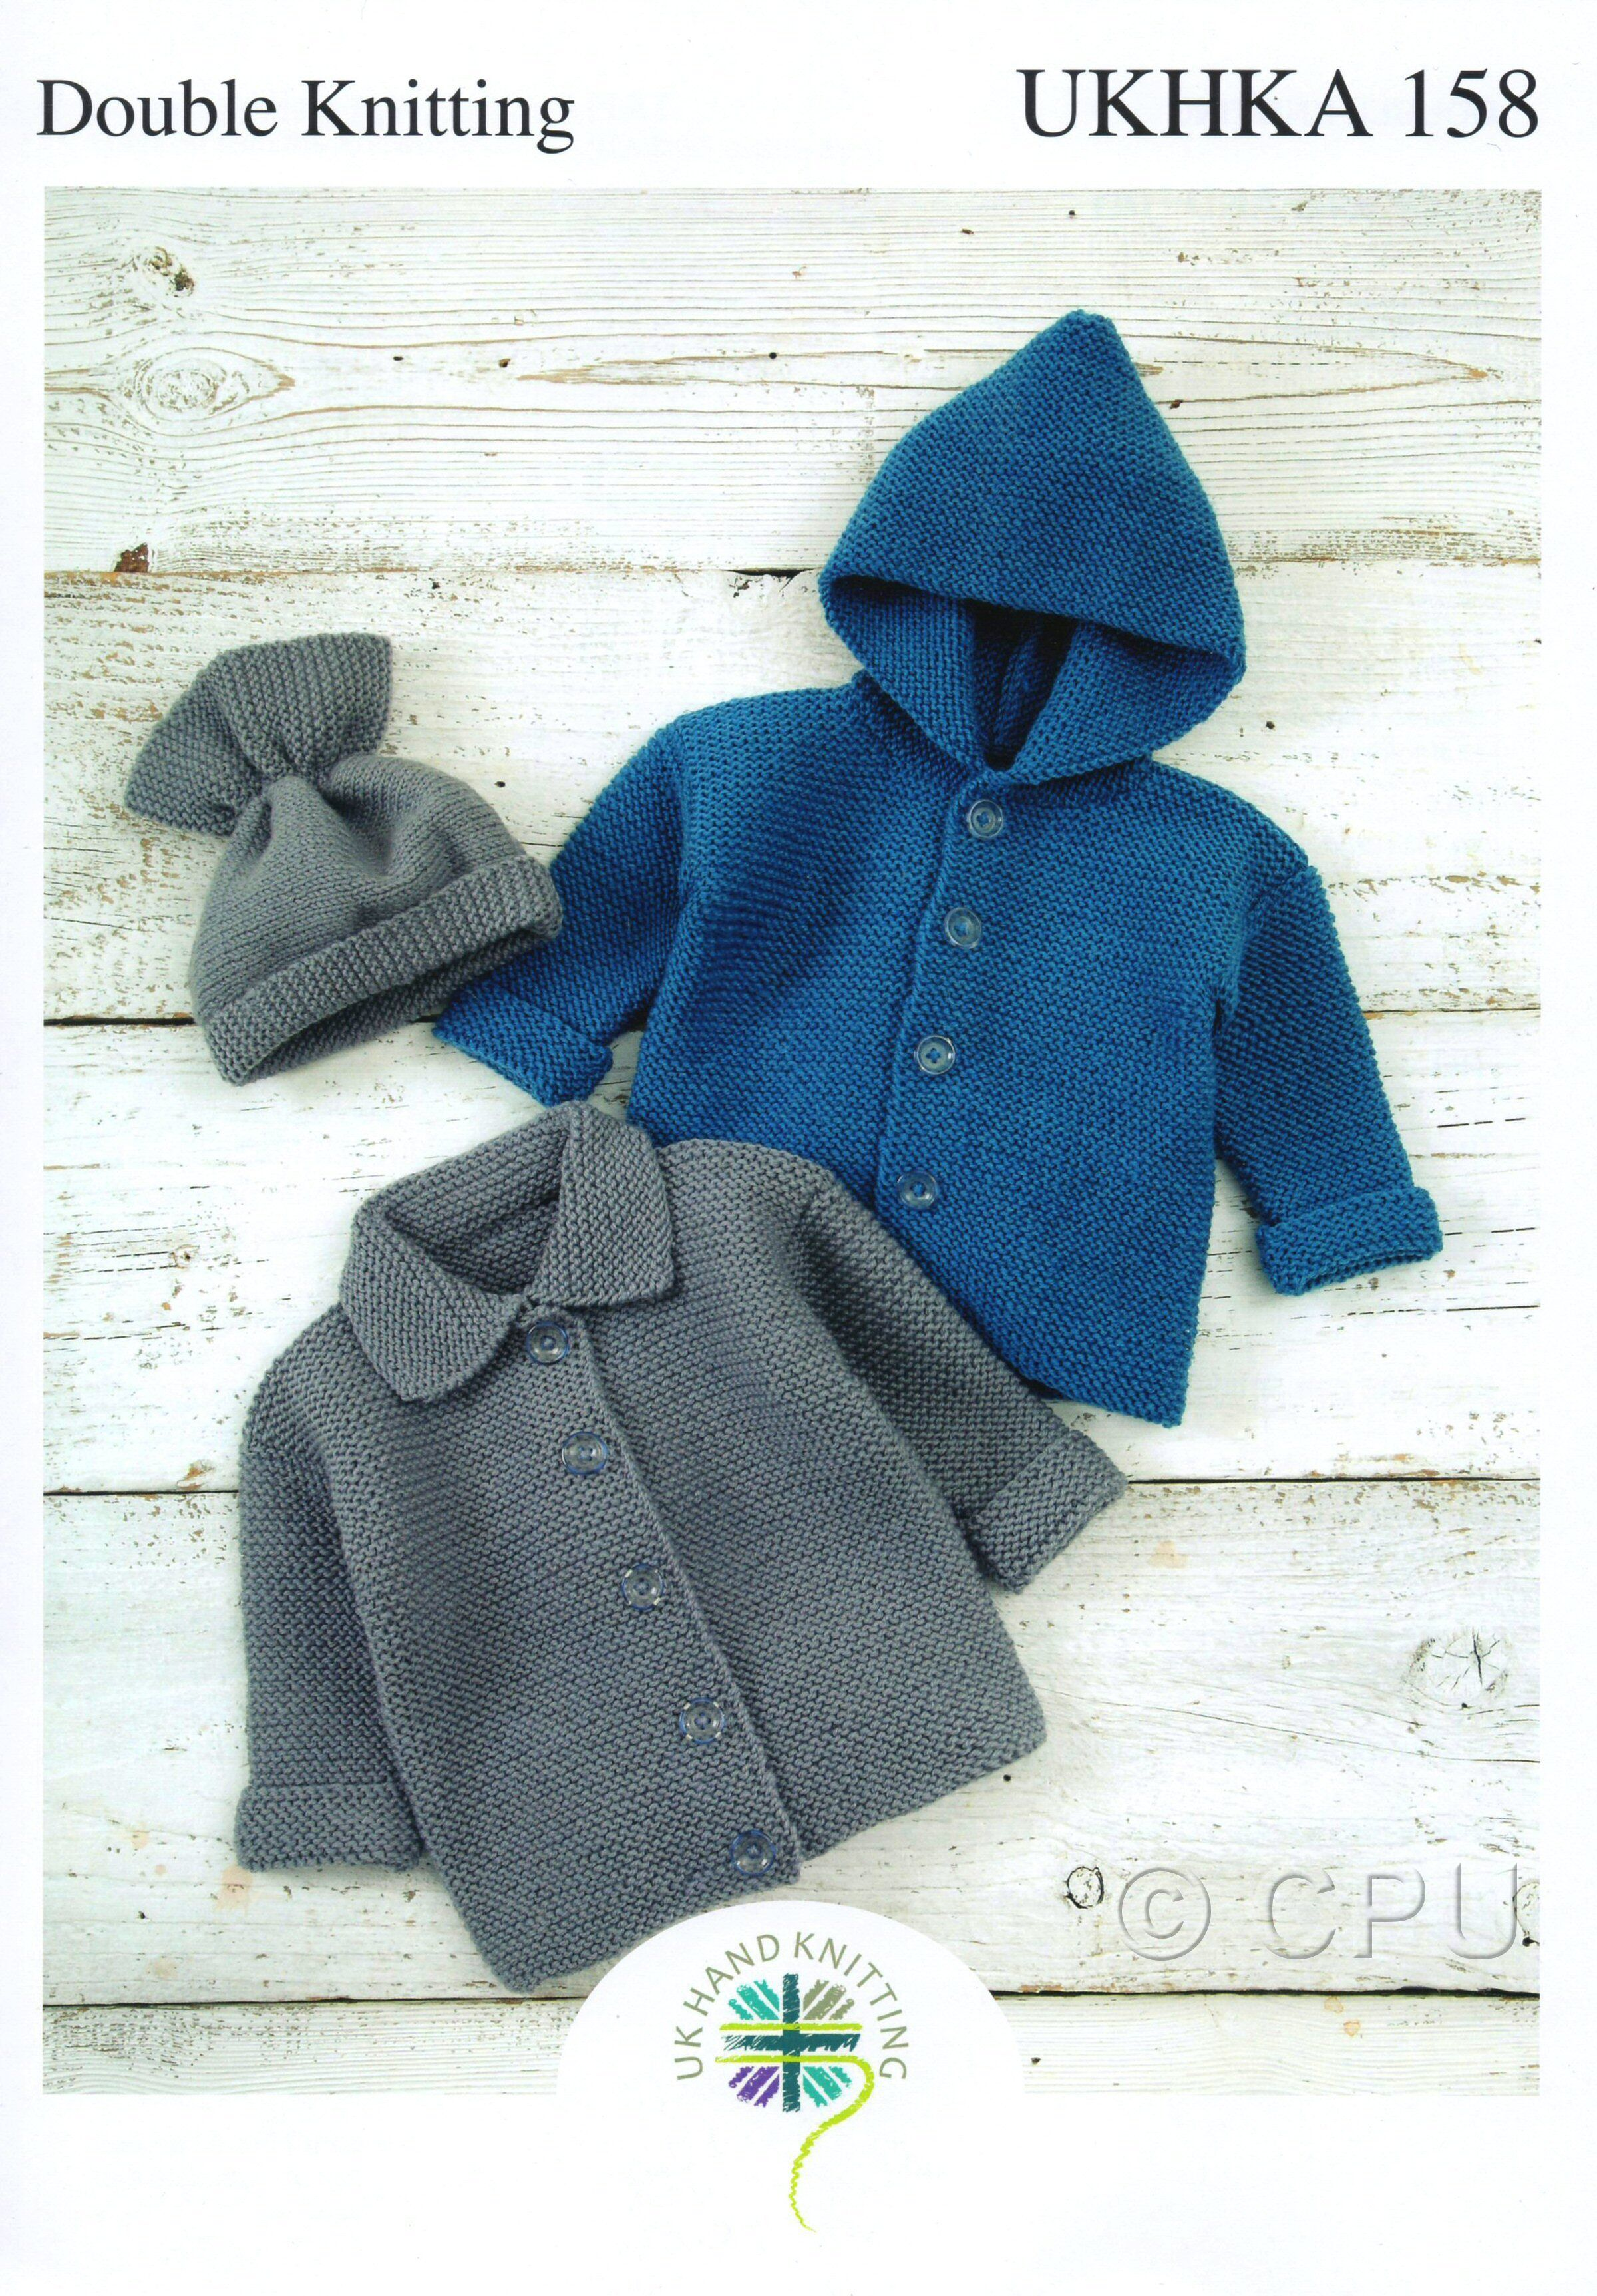 Uk hand knitting association pattern leaflet ukhka158 230 double uk hand knitting association pattern leaflet ukhka158 230 double knit knitted jackets and hat chest bankloansurffo Gallery